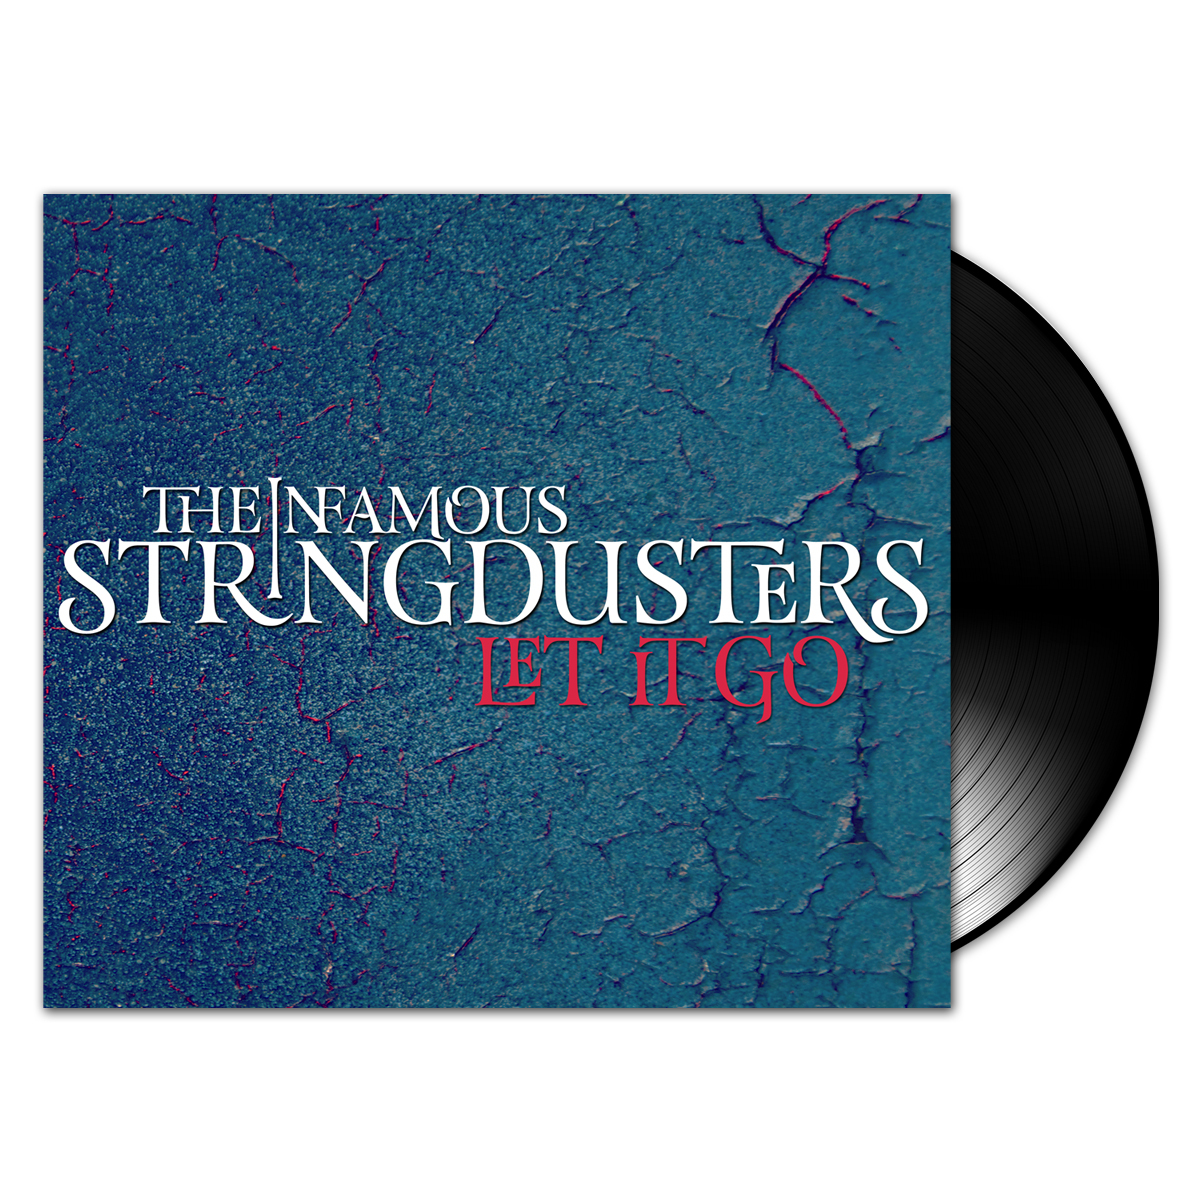 The Stringdusters - Let It Go Vinyl